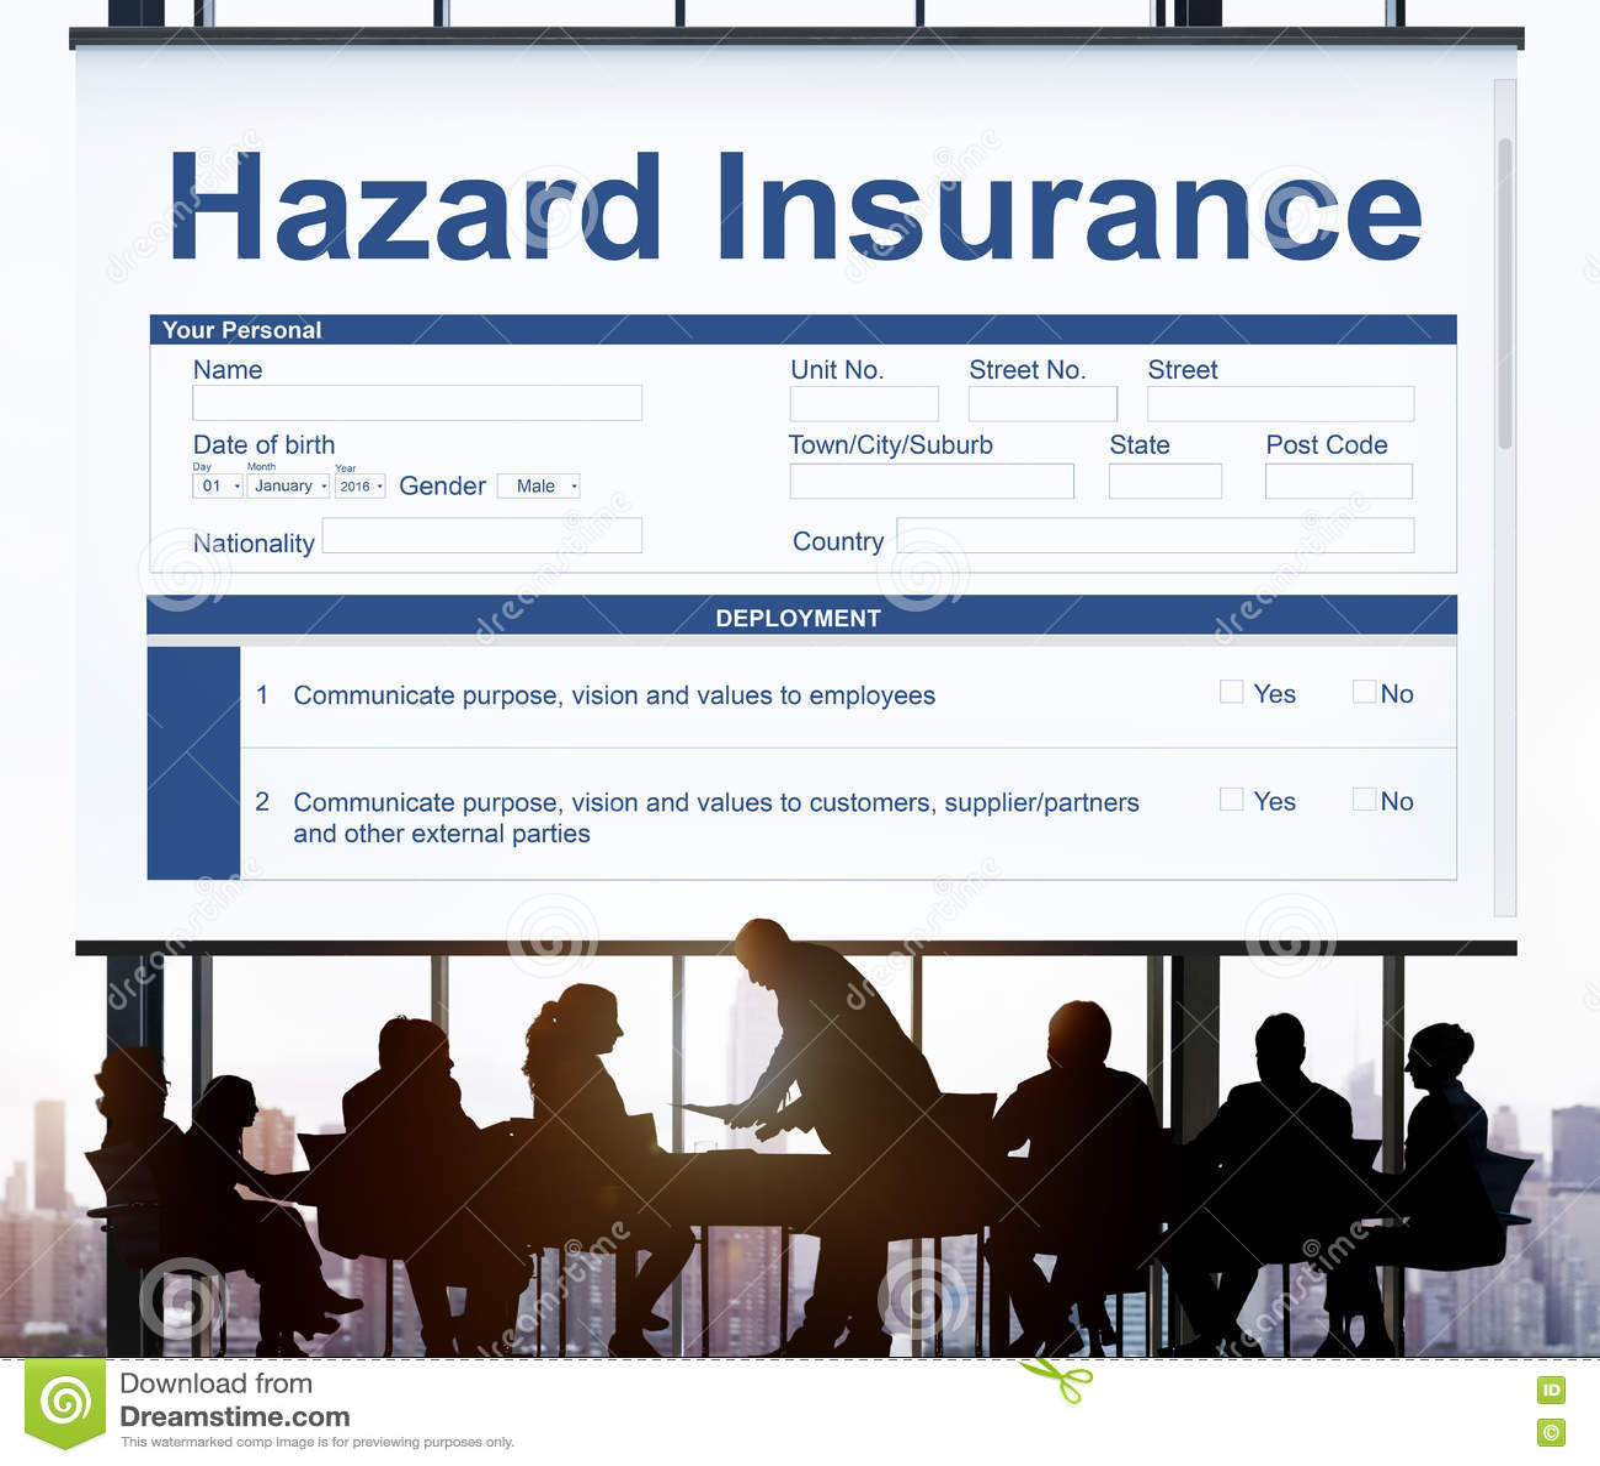 Hazard Insurance Quotes Hazard Insurance Quote  44Billionlater